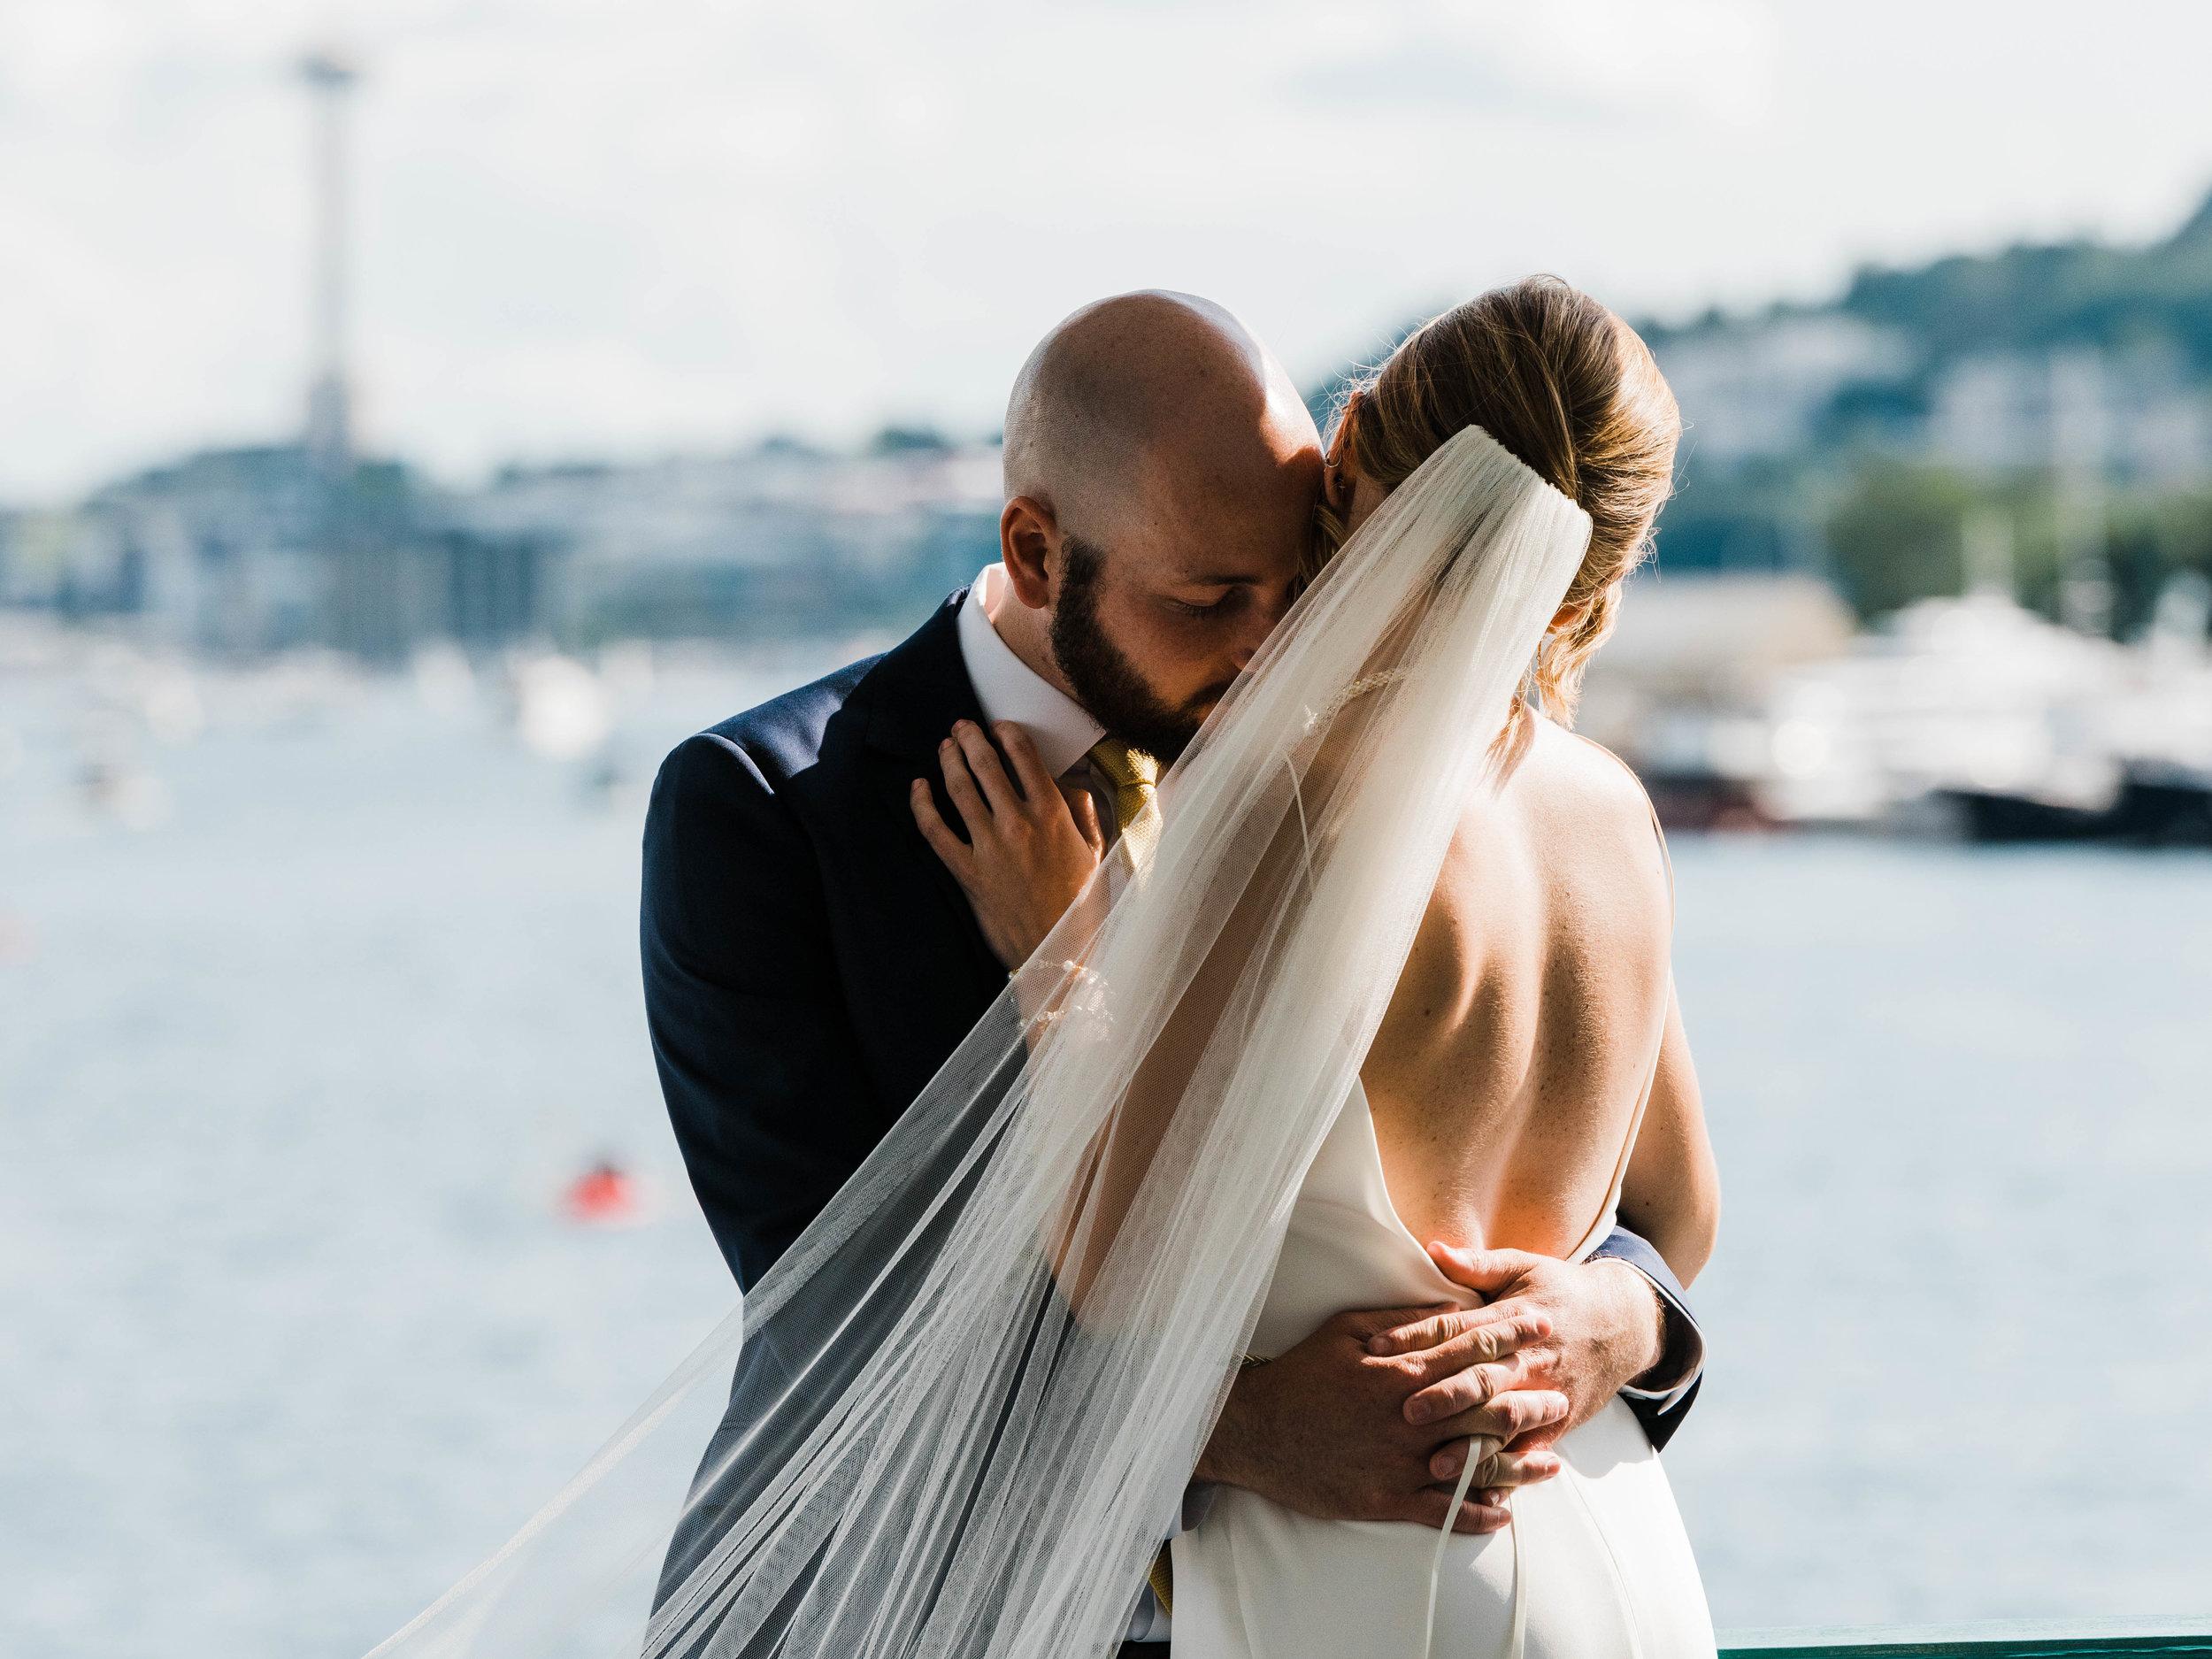 Seattle Wedding- MV Skansonia - Anna + Josh -  (1138) - Copy.jpg